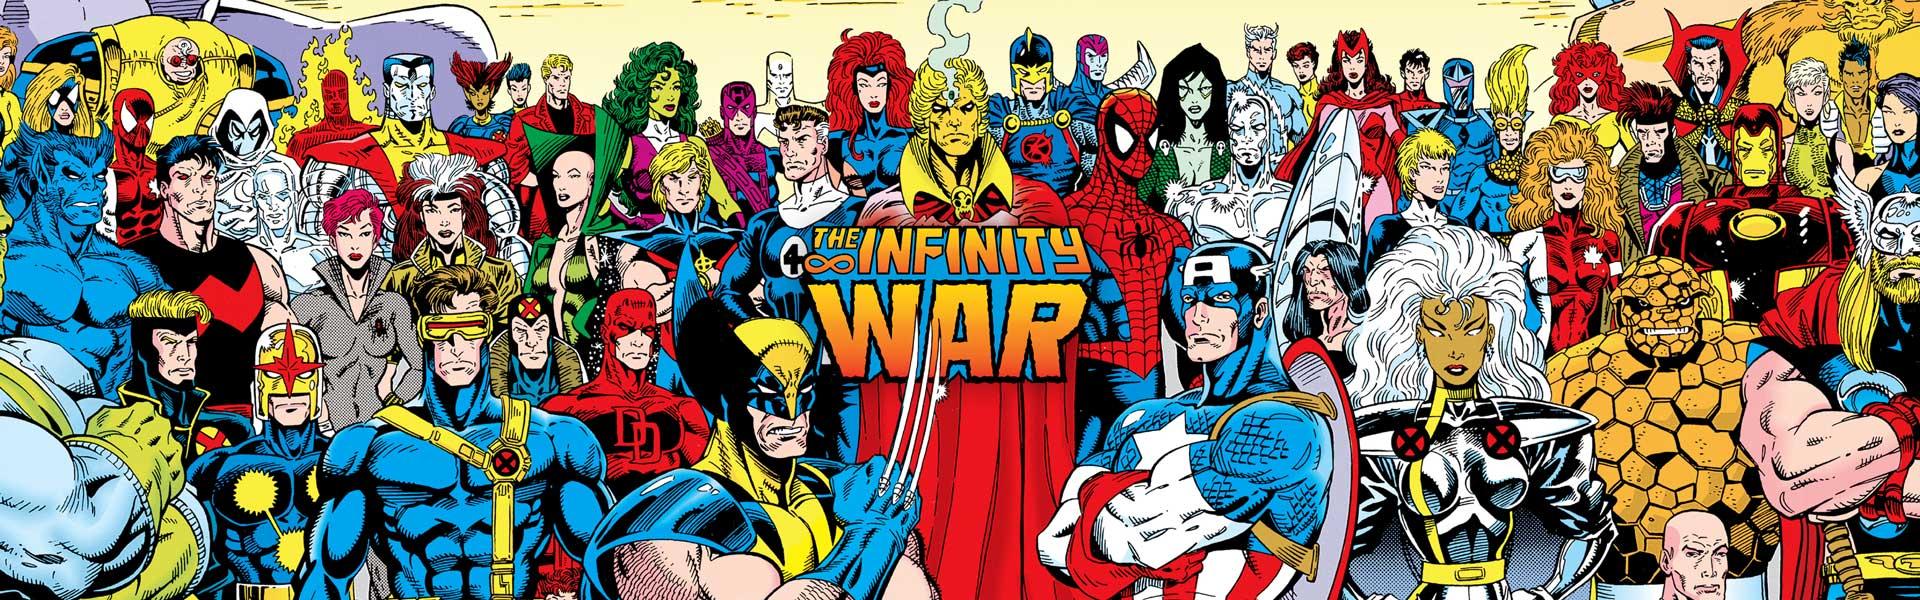 Infinity War Comic Book Release Date